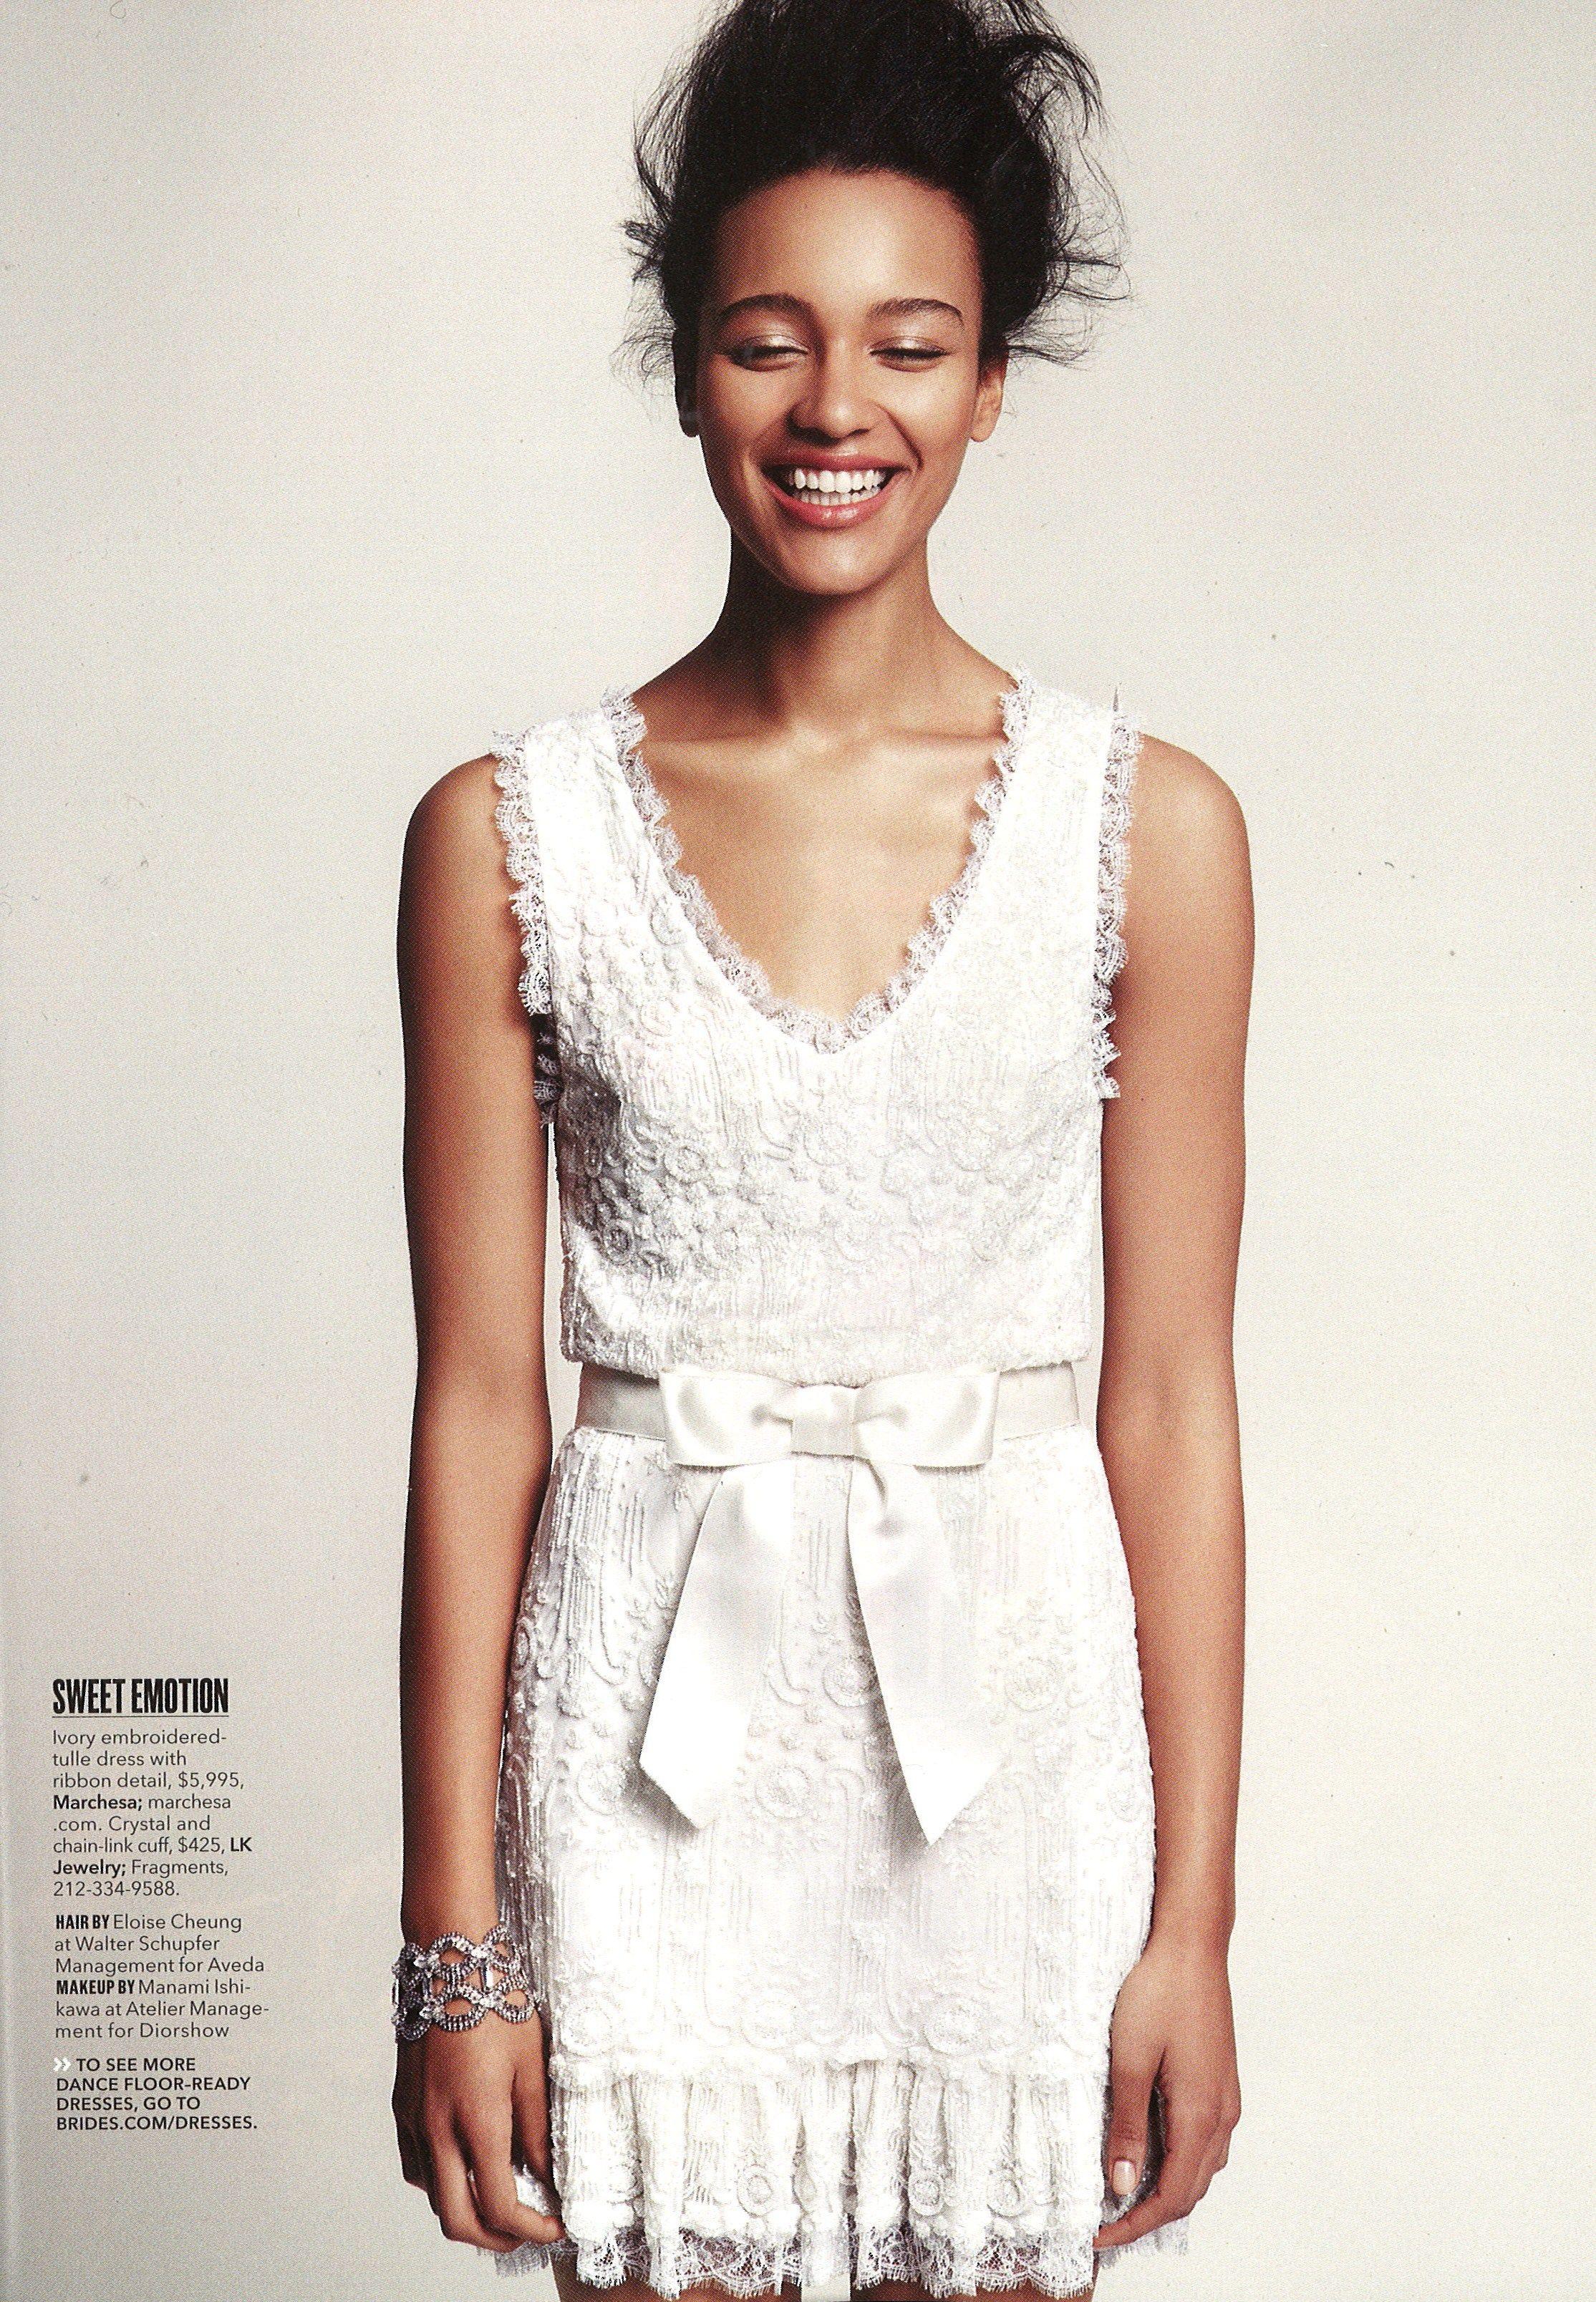 Marchesa Bridal Tail Chic In Brides Magazine